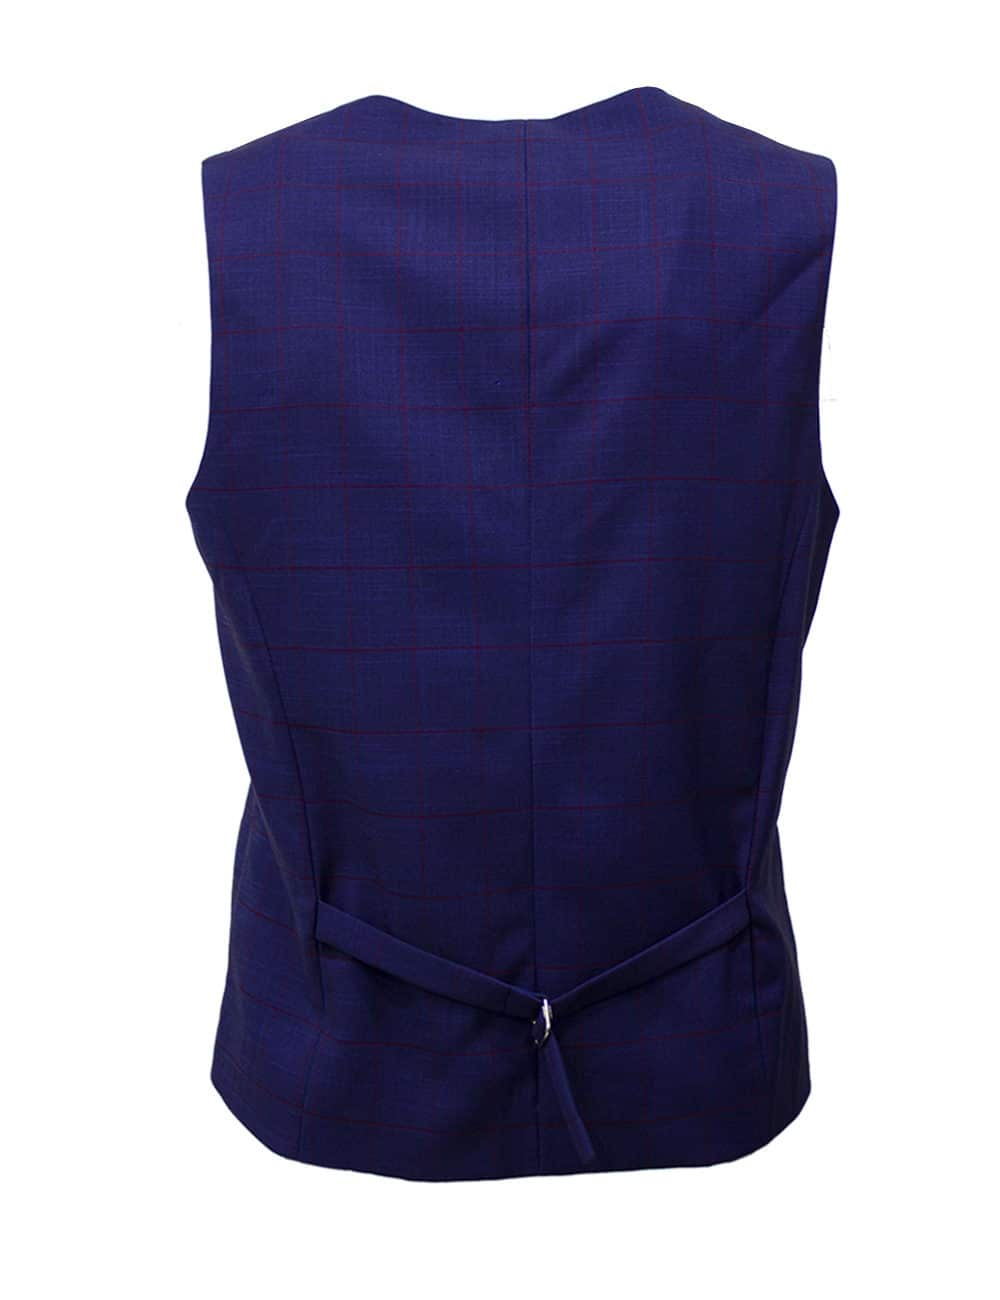 Tailored Fit Navy Checks Single Breasted Vest V1V5.2